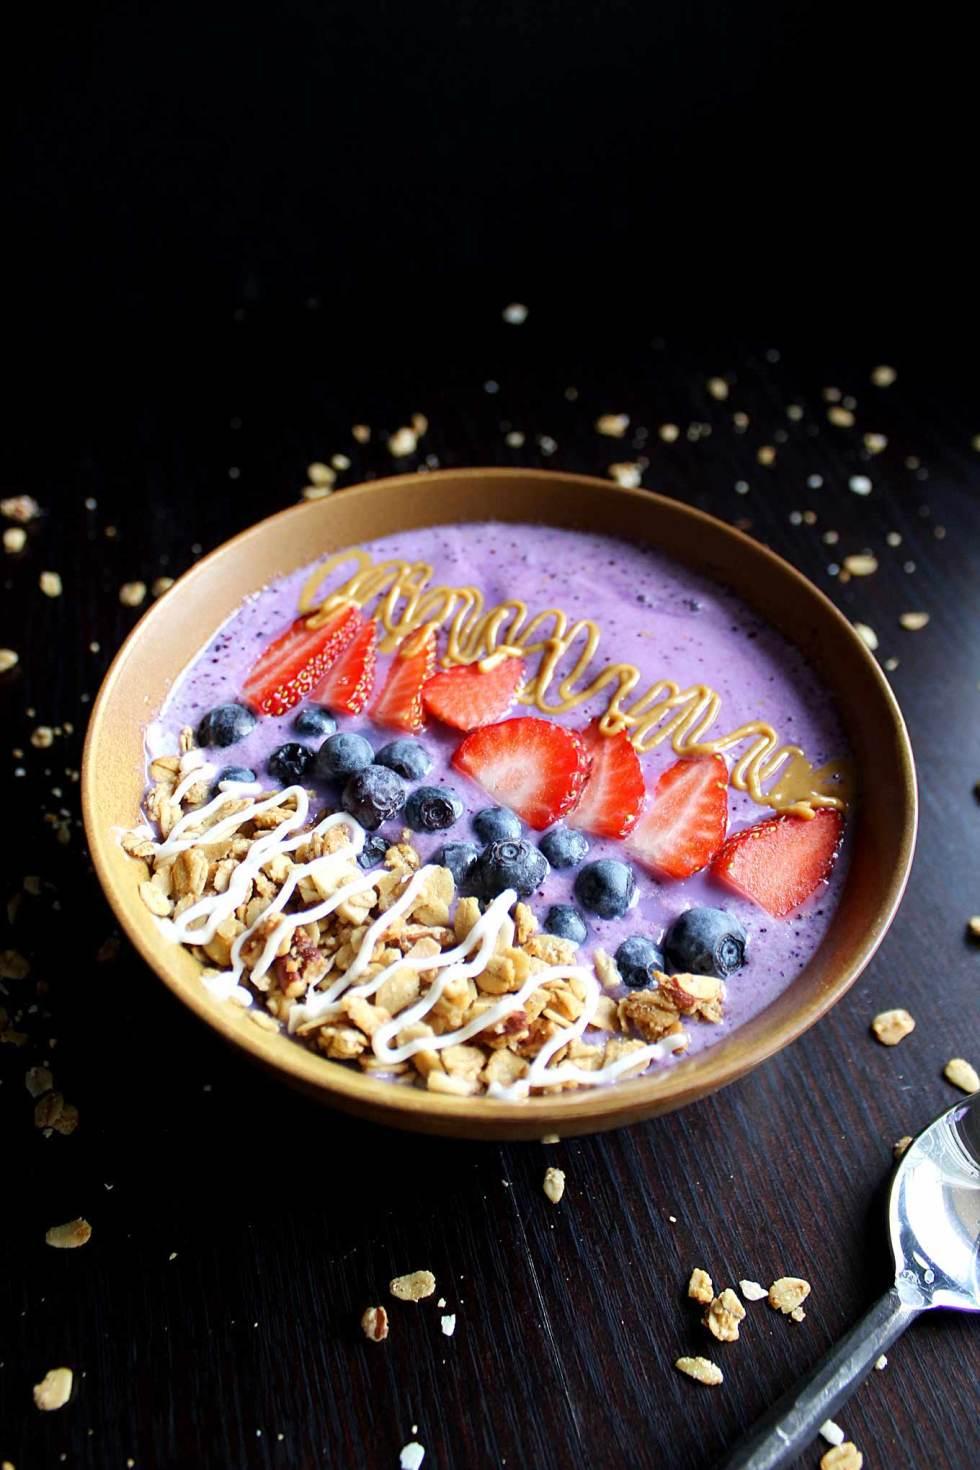 Triple Berry Smoothie | Easy Smoothie Bowl | Vegan | Vegetarian | Homemade Granola | Antioxidants